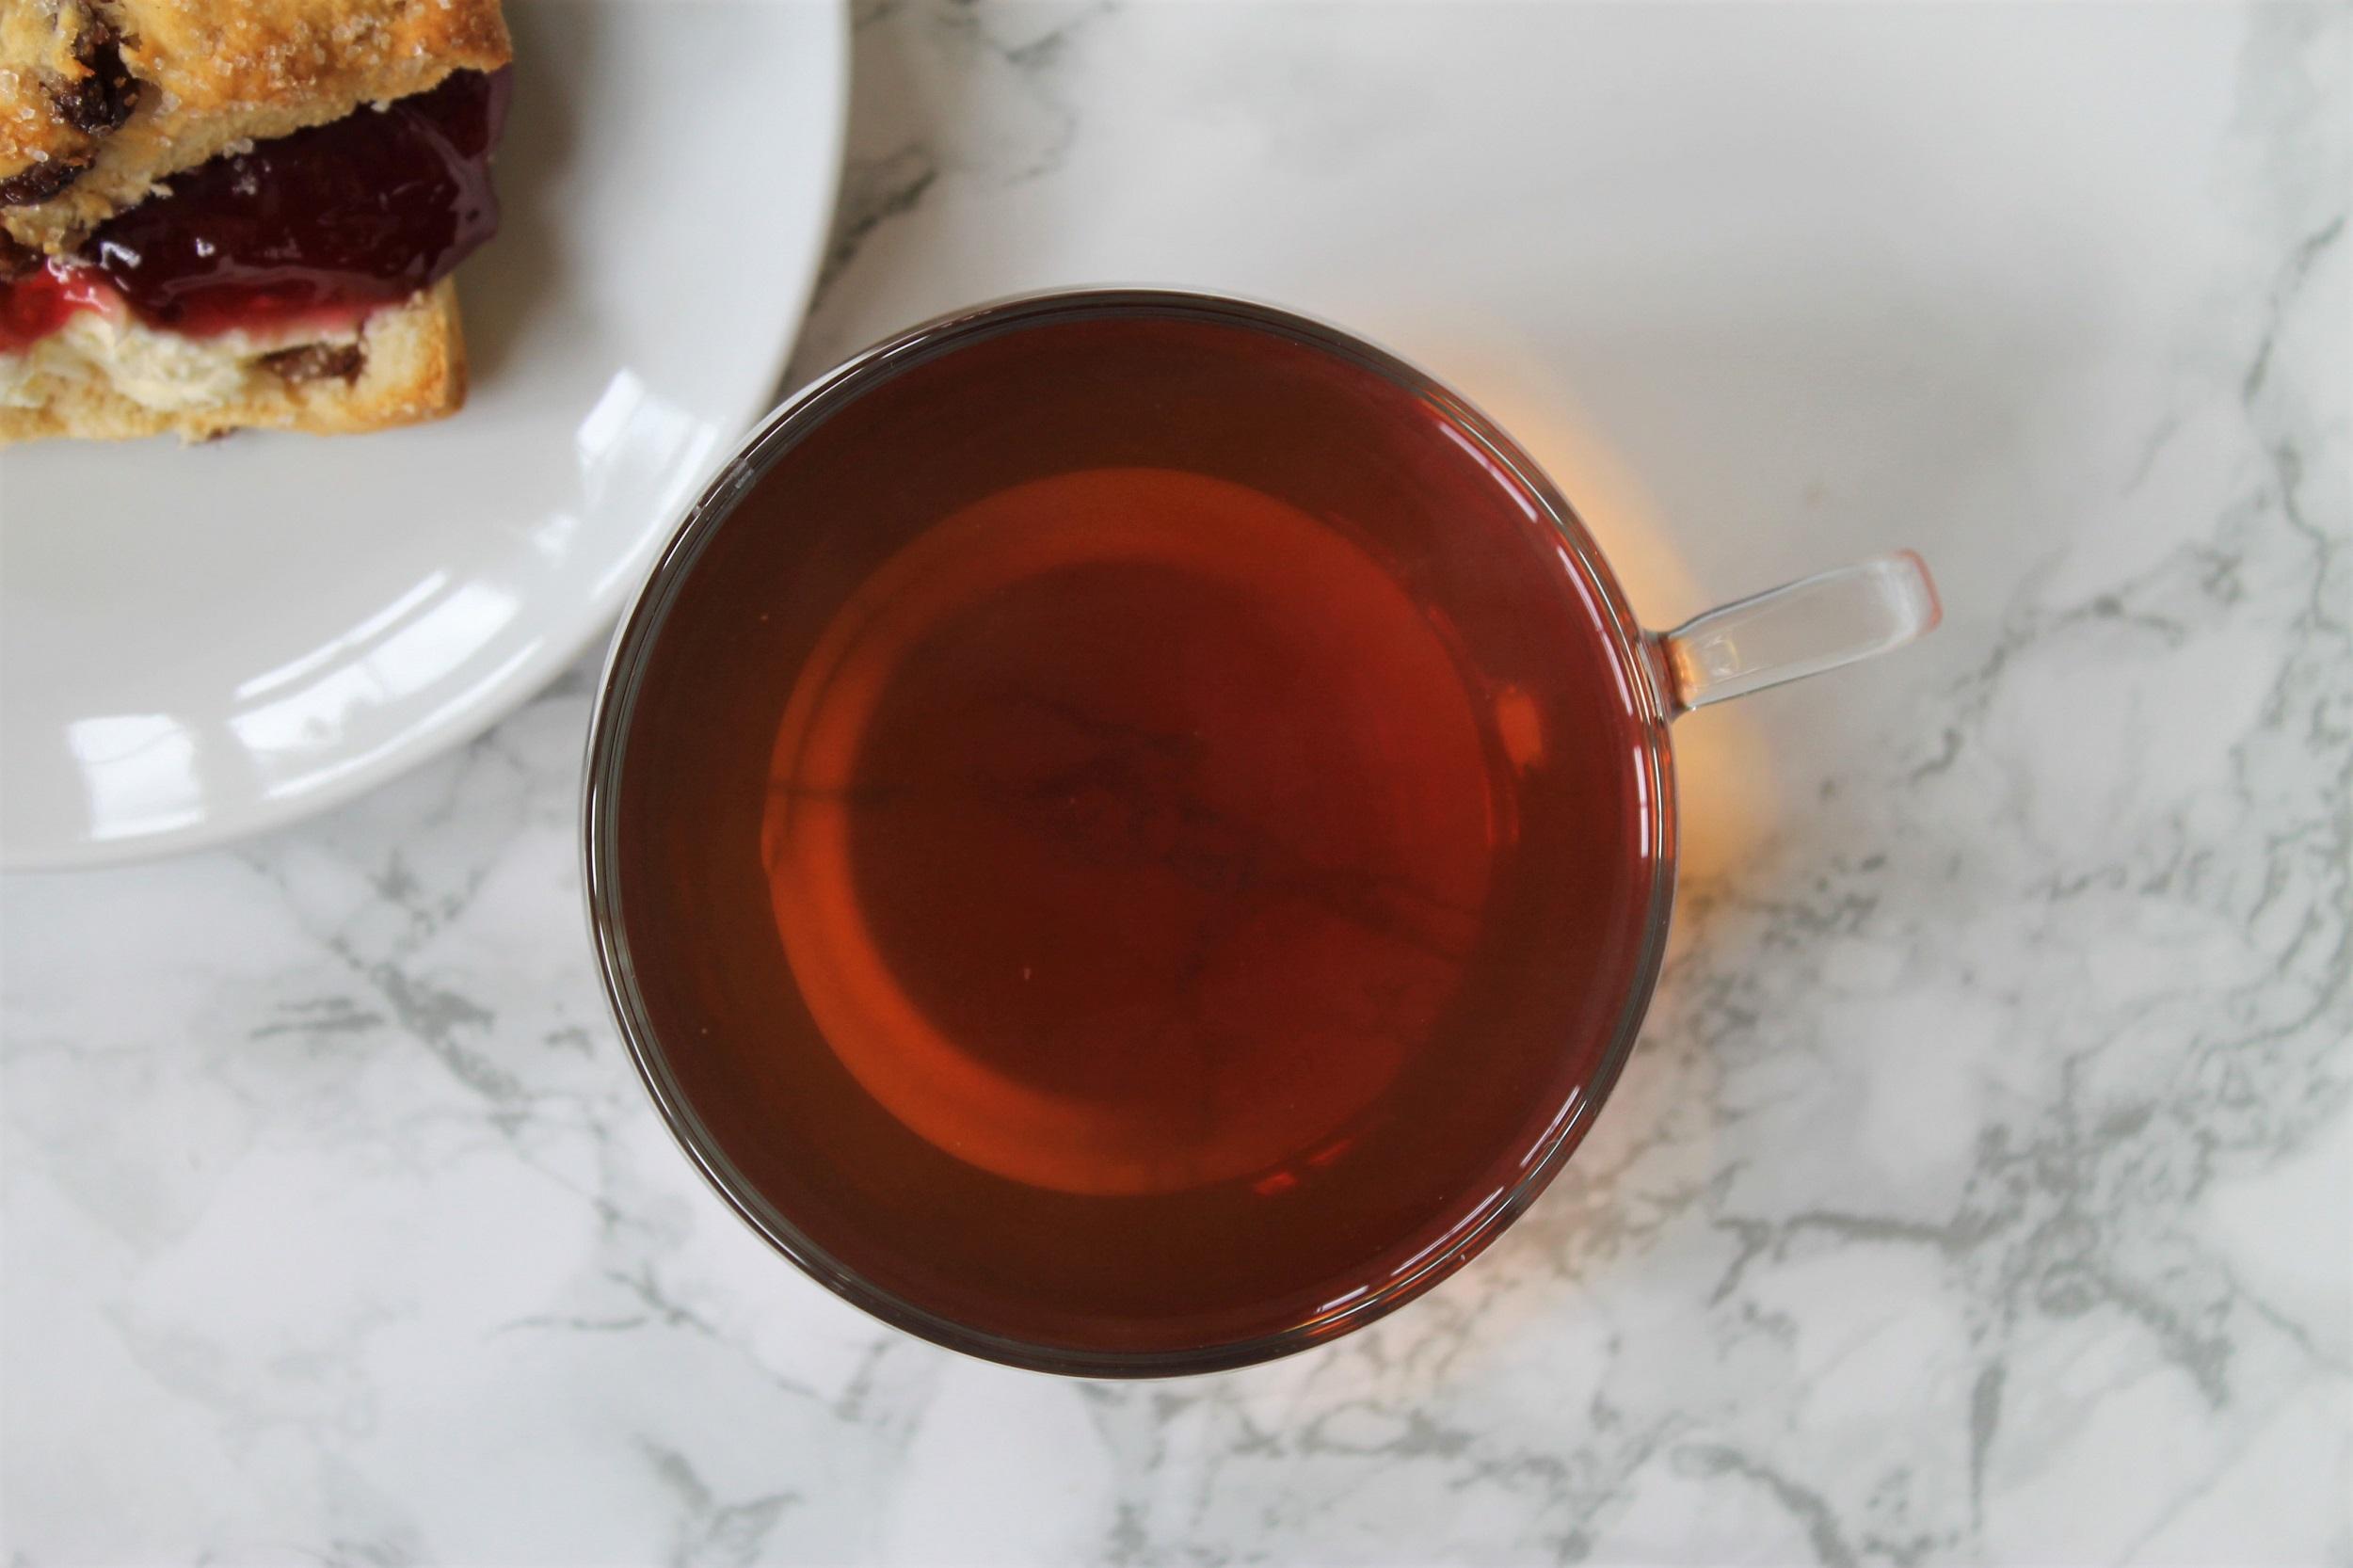 earl grey cream tea in teacup